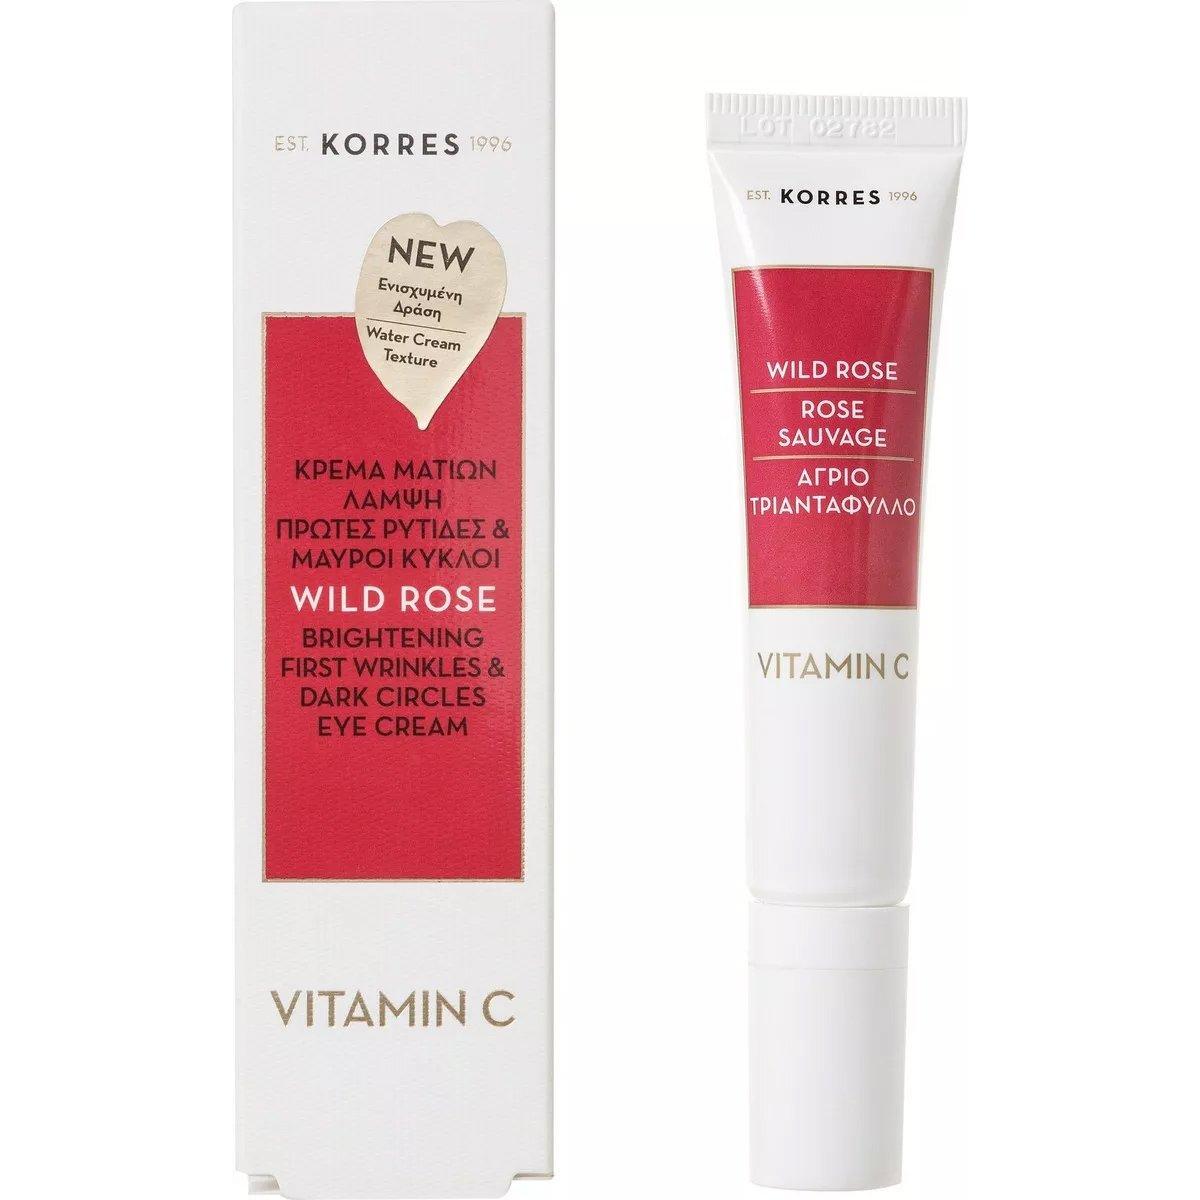 Korres Wild Rose Eye Cream With Vitamin C Κρέμα Ματιών Άγριο Τραντάφυλλο, για Λάμψη, Λεπτές Γραμμές & Μαύρους Κύκλους 15ml